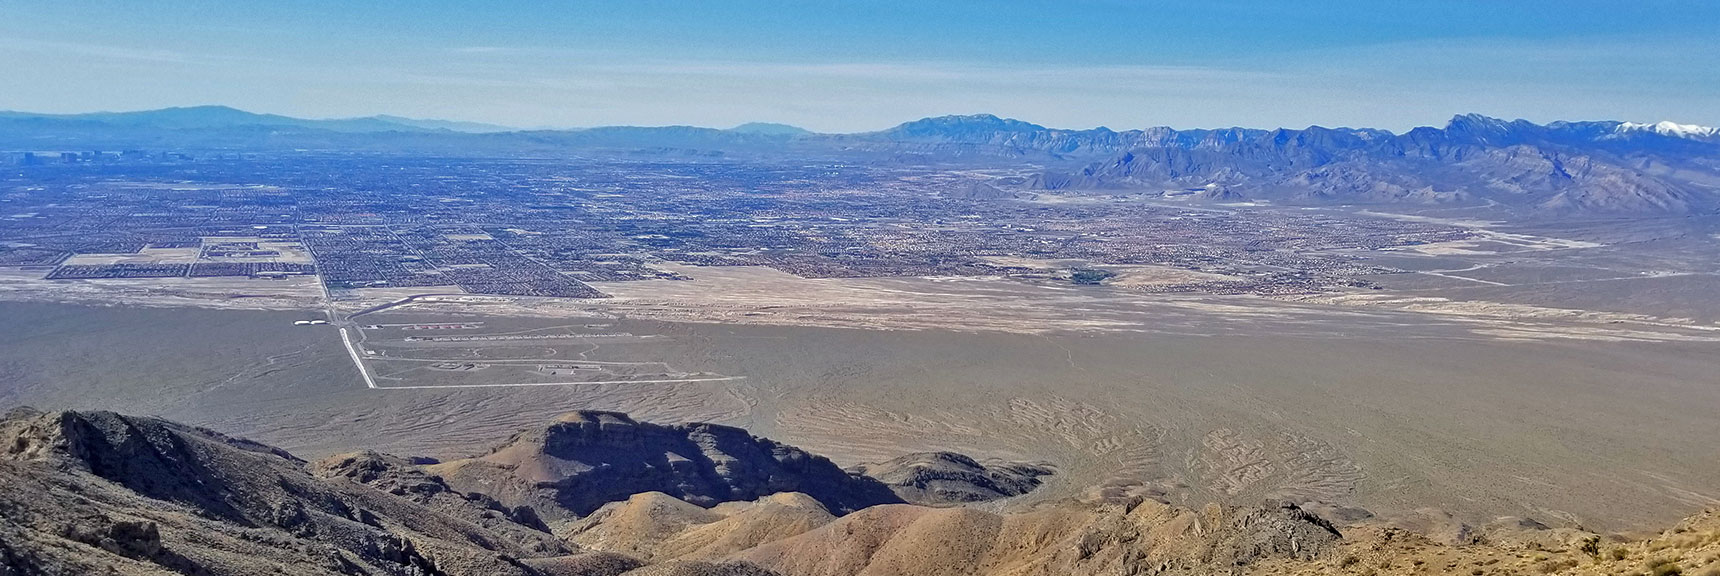 View of Las Vegas and the Western Mountains Upon Topping the Gass Peak Mid-Summit Ridge | Gass Peak Eastern Summit Ultra-marathon Adventure, Nevada